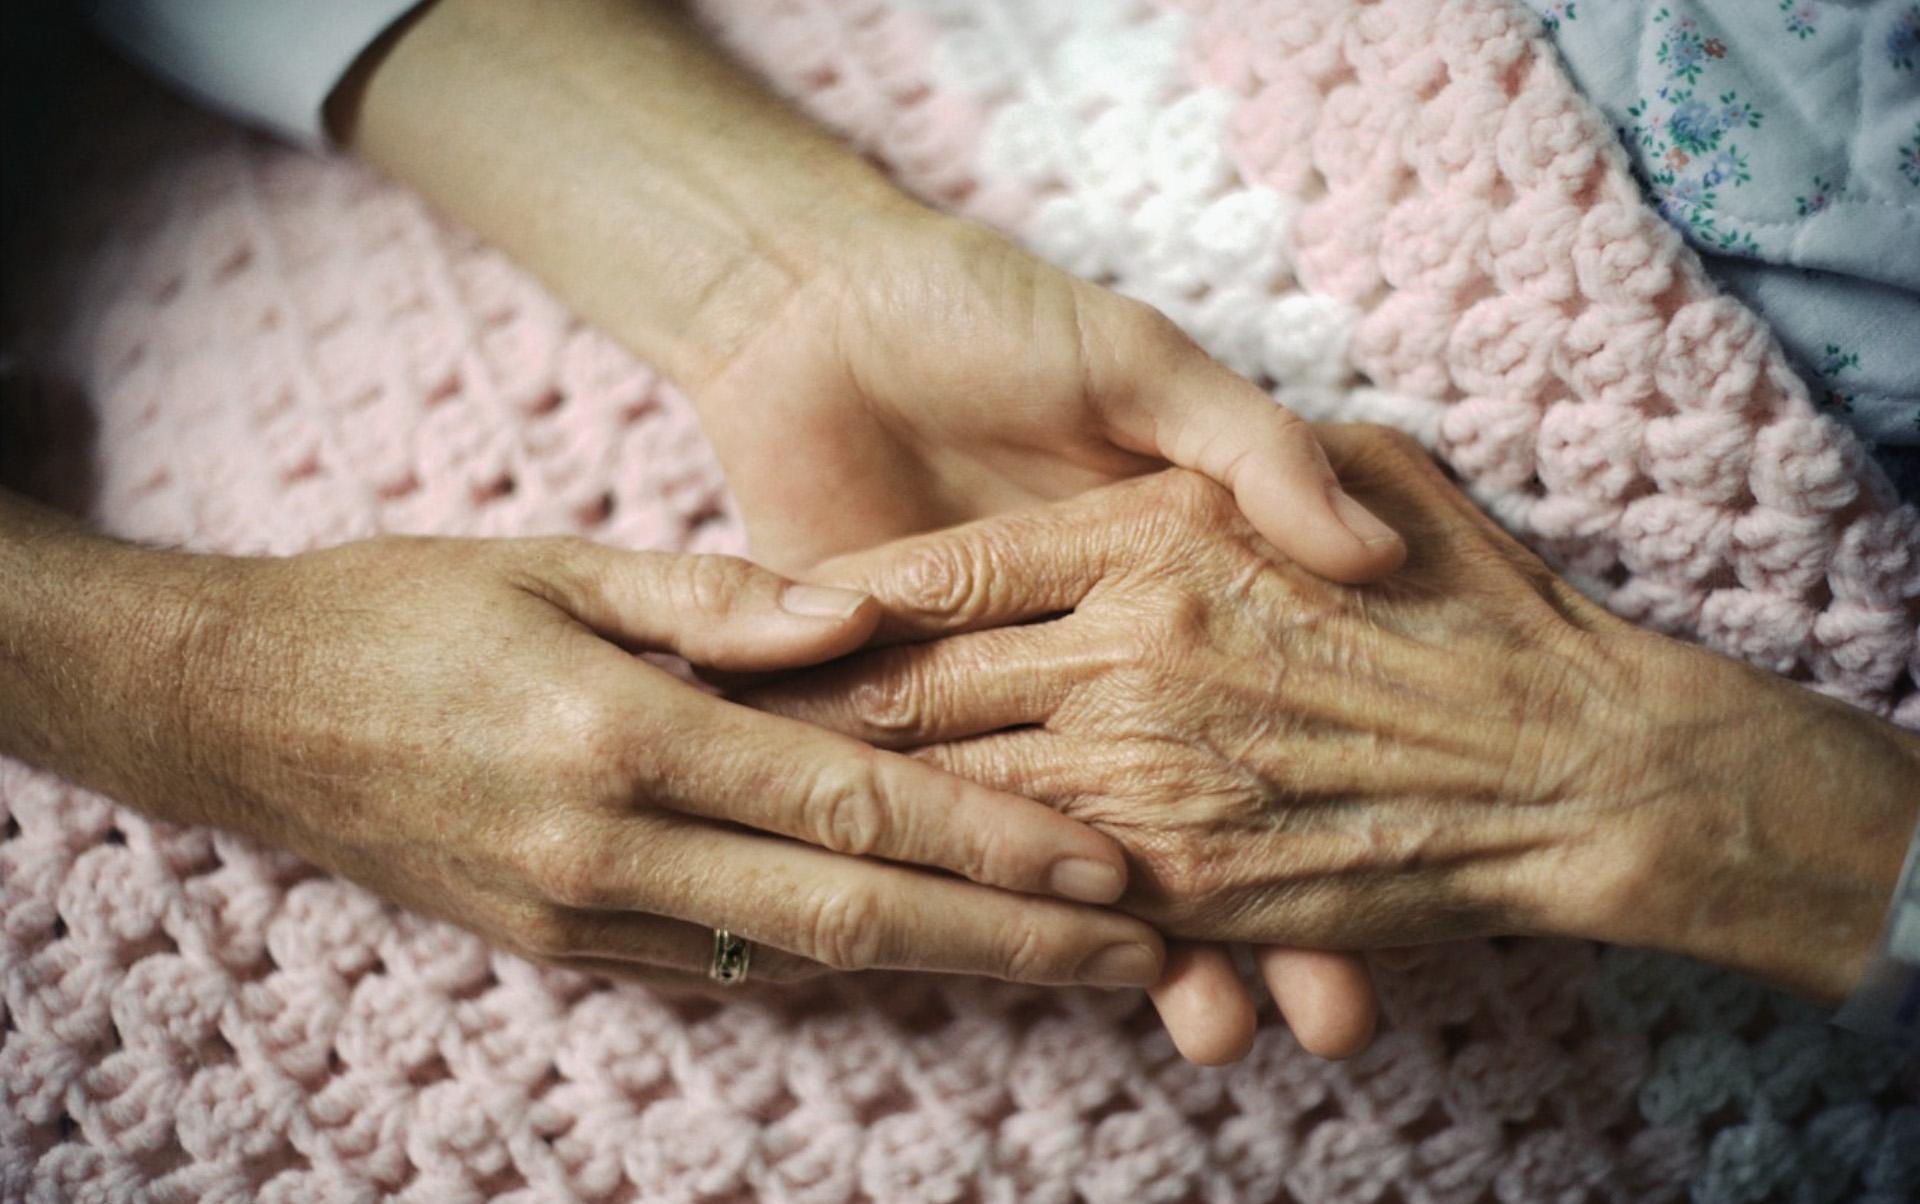 holding hand of elderly patient